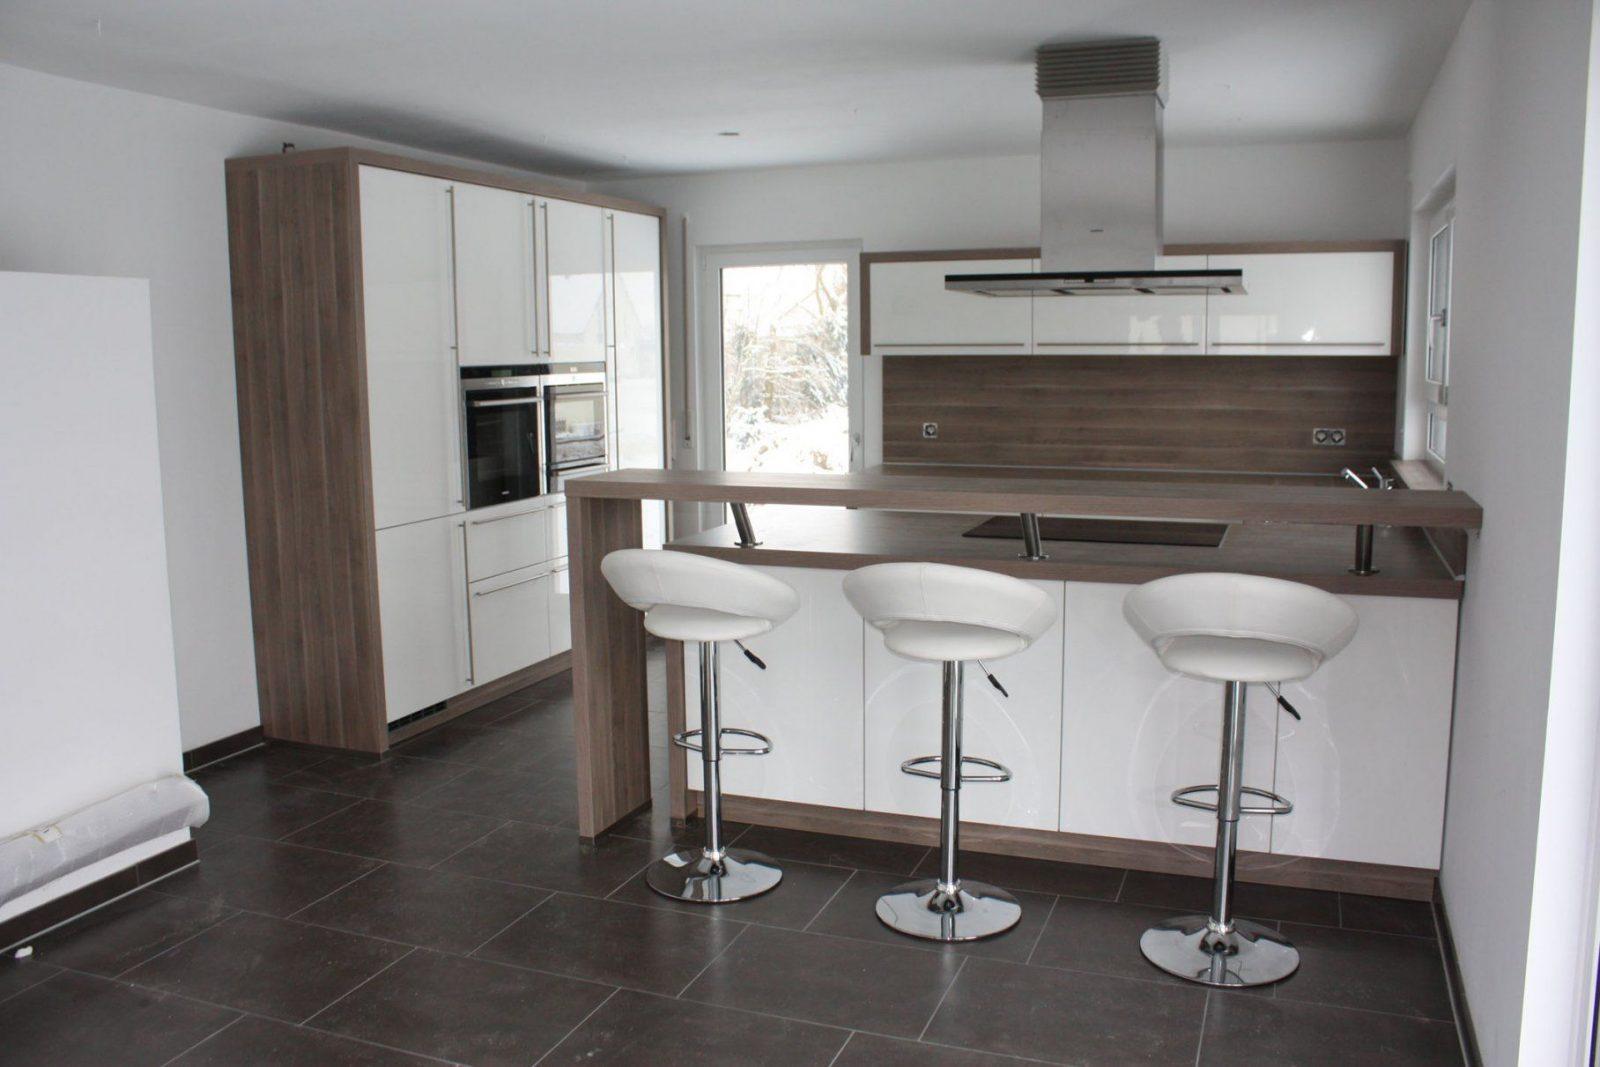 Nolte Kuechen Mit Kochinsel Kalt Nolte Küchen Online Kaufen Am von Nolte Küchen Mit Kochinsel Bild